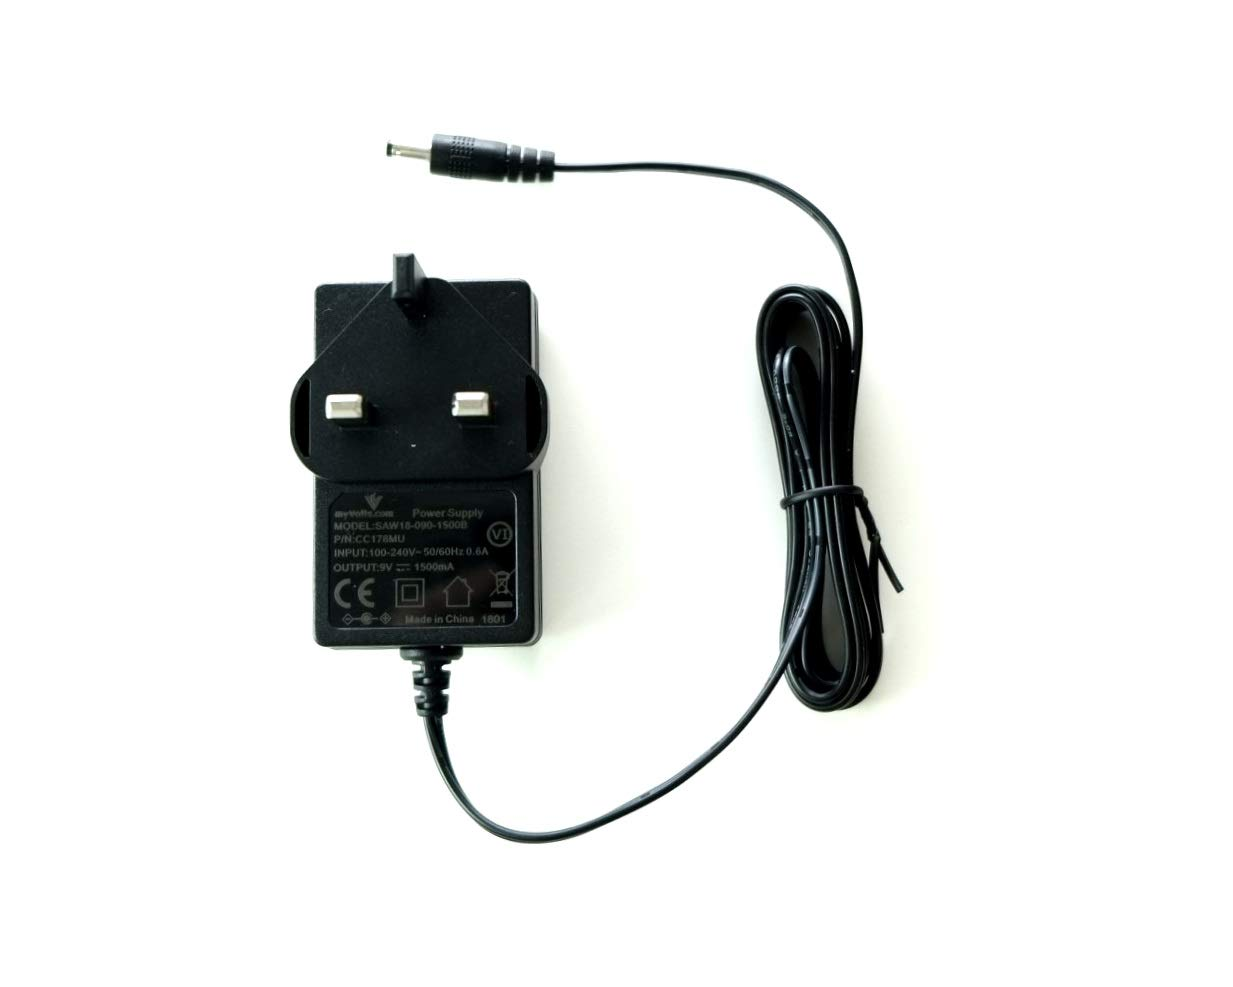 UK plug Premium MyVolts 9V power supply adaptor compatible with Casio CTK-3200 Keyboard